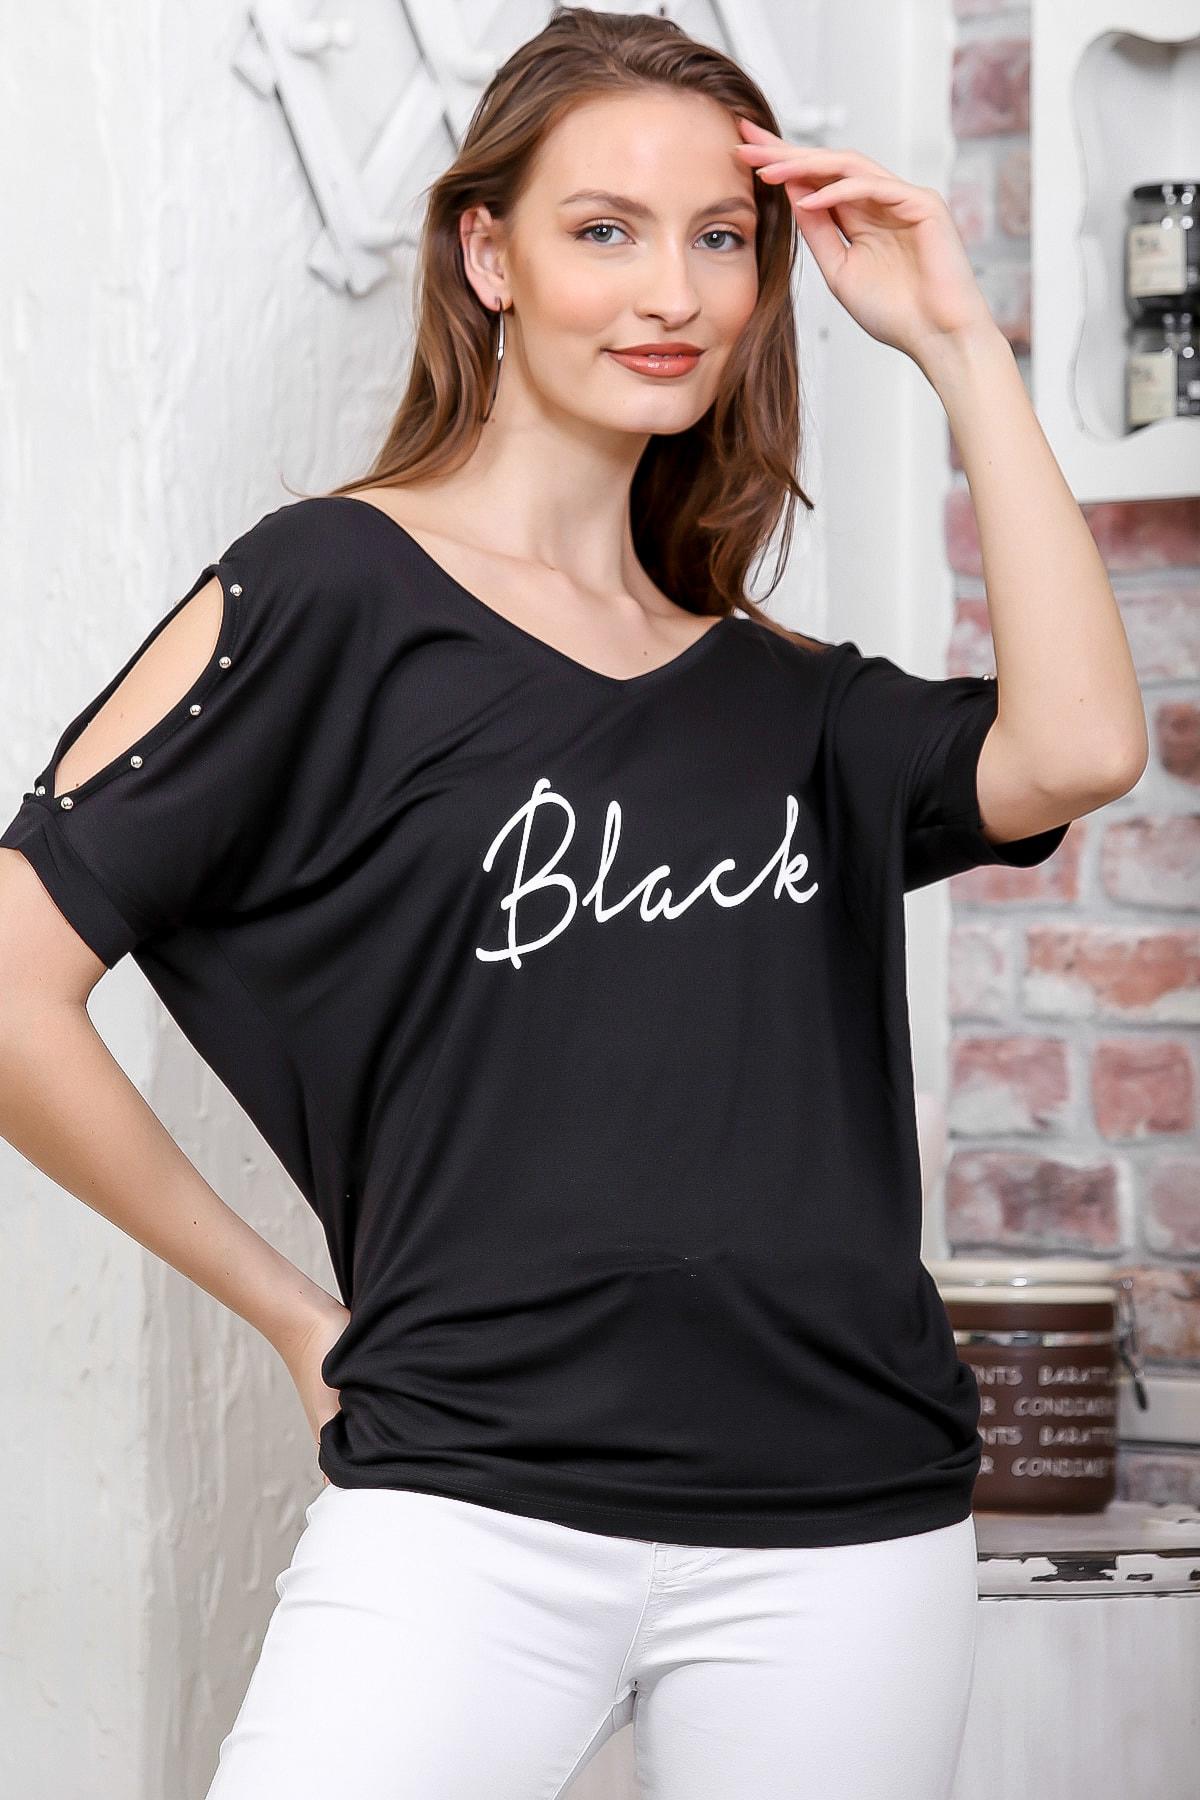 Chiccy Kadın Siyah Ön Arka V Yaka Omuz Pencereli Baskılı T-Shirt M10010300TS98278